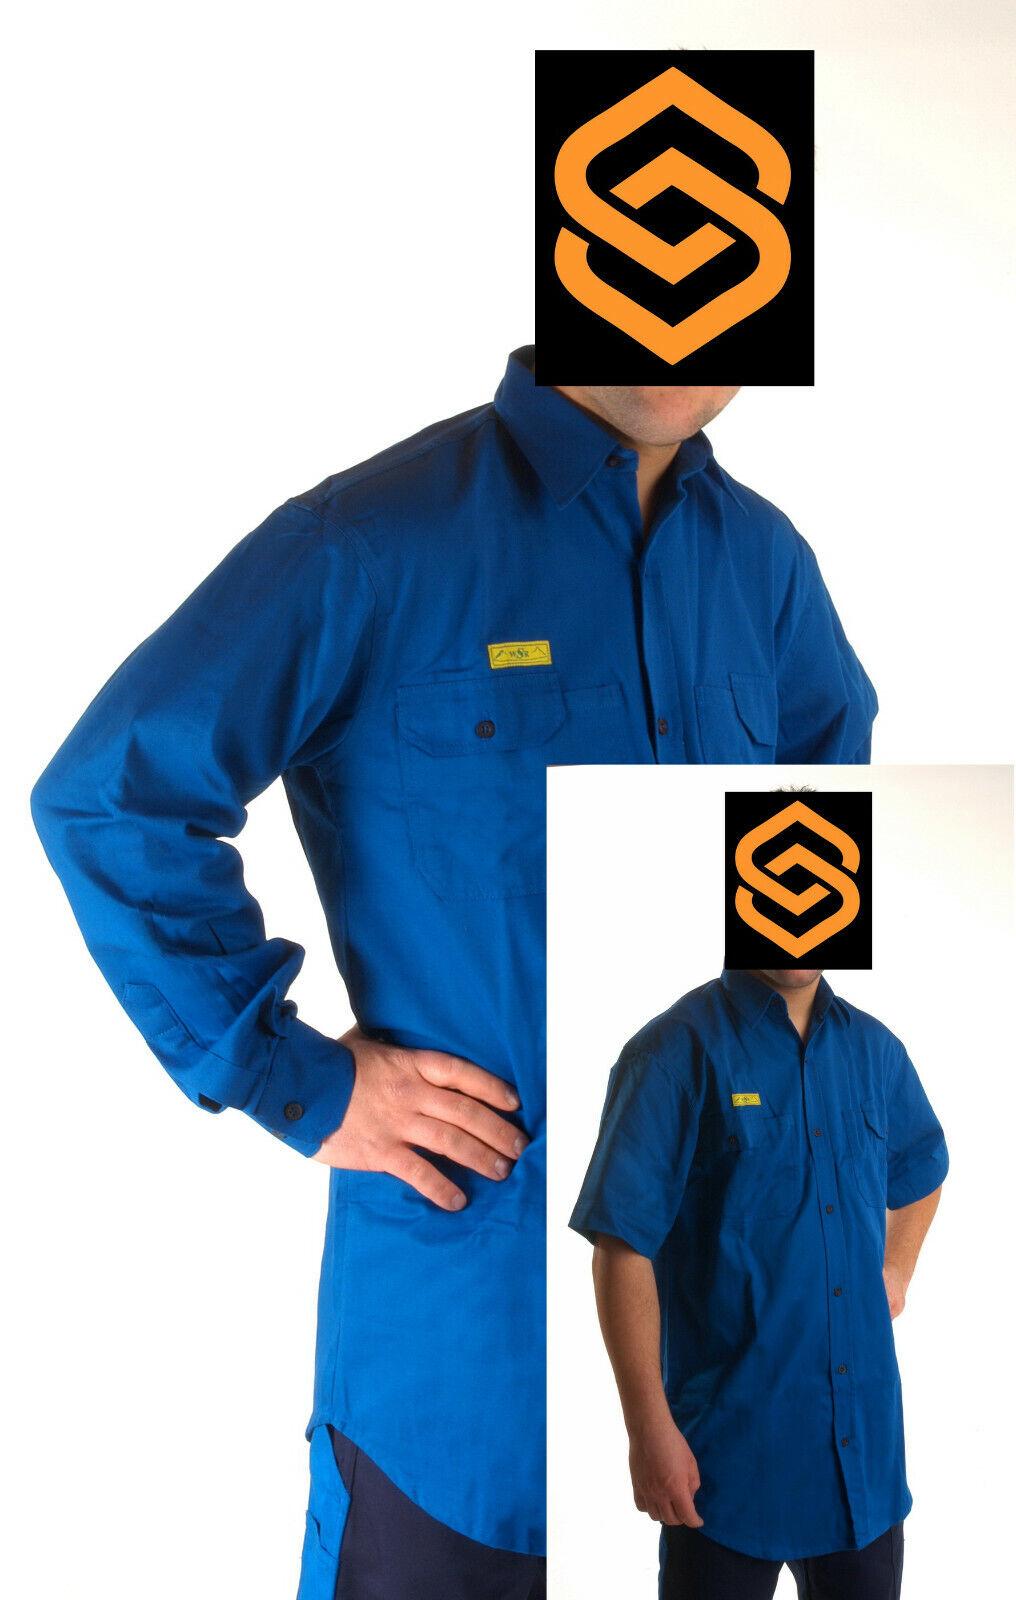 Arbeitshemd in Kurzarm & Langarm Herrenhemd Hemd Arbeitsshirt Business Kleidung